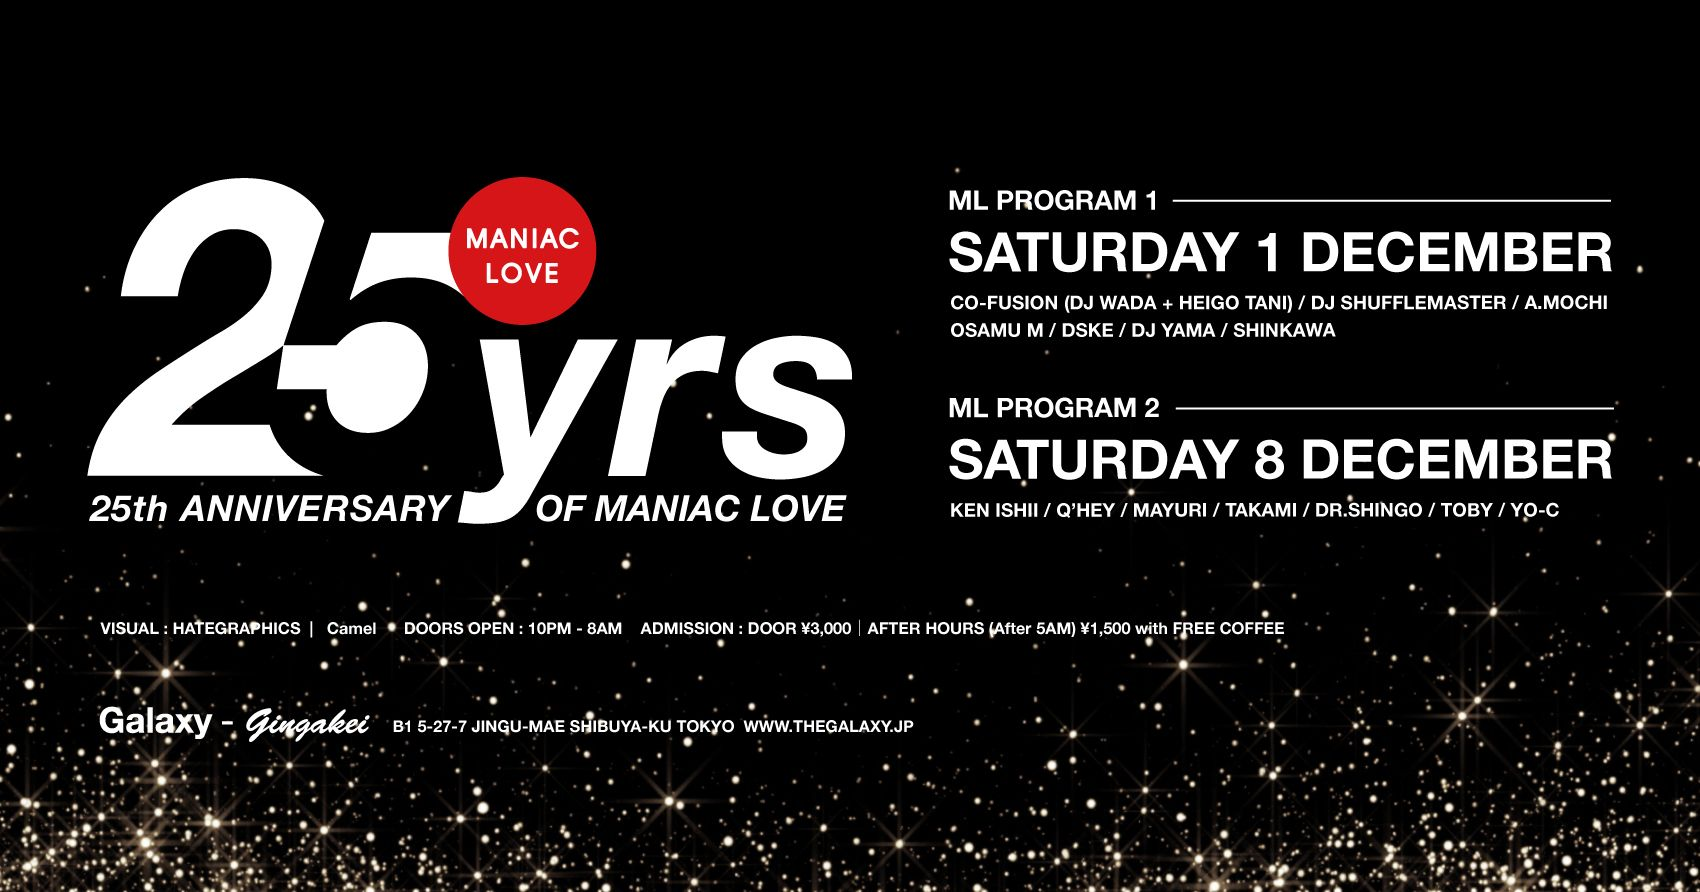 25th Anniversary of Maniac Love